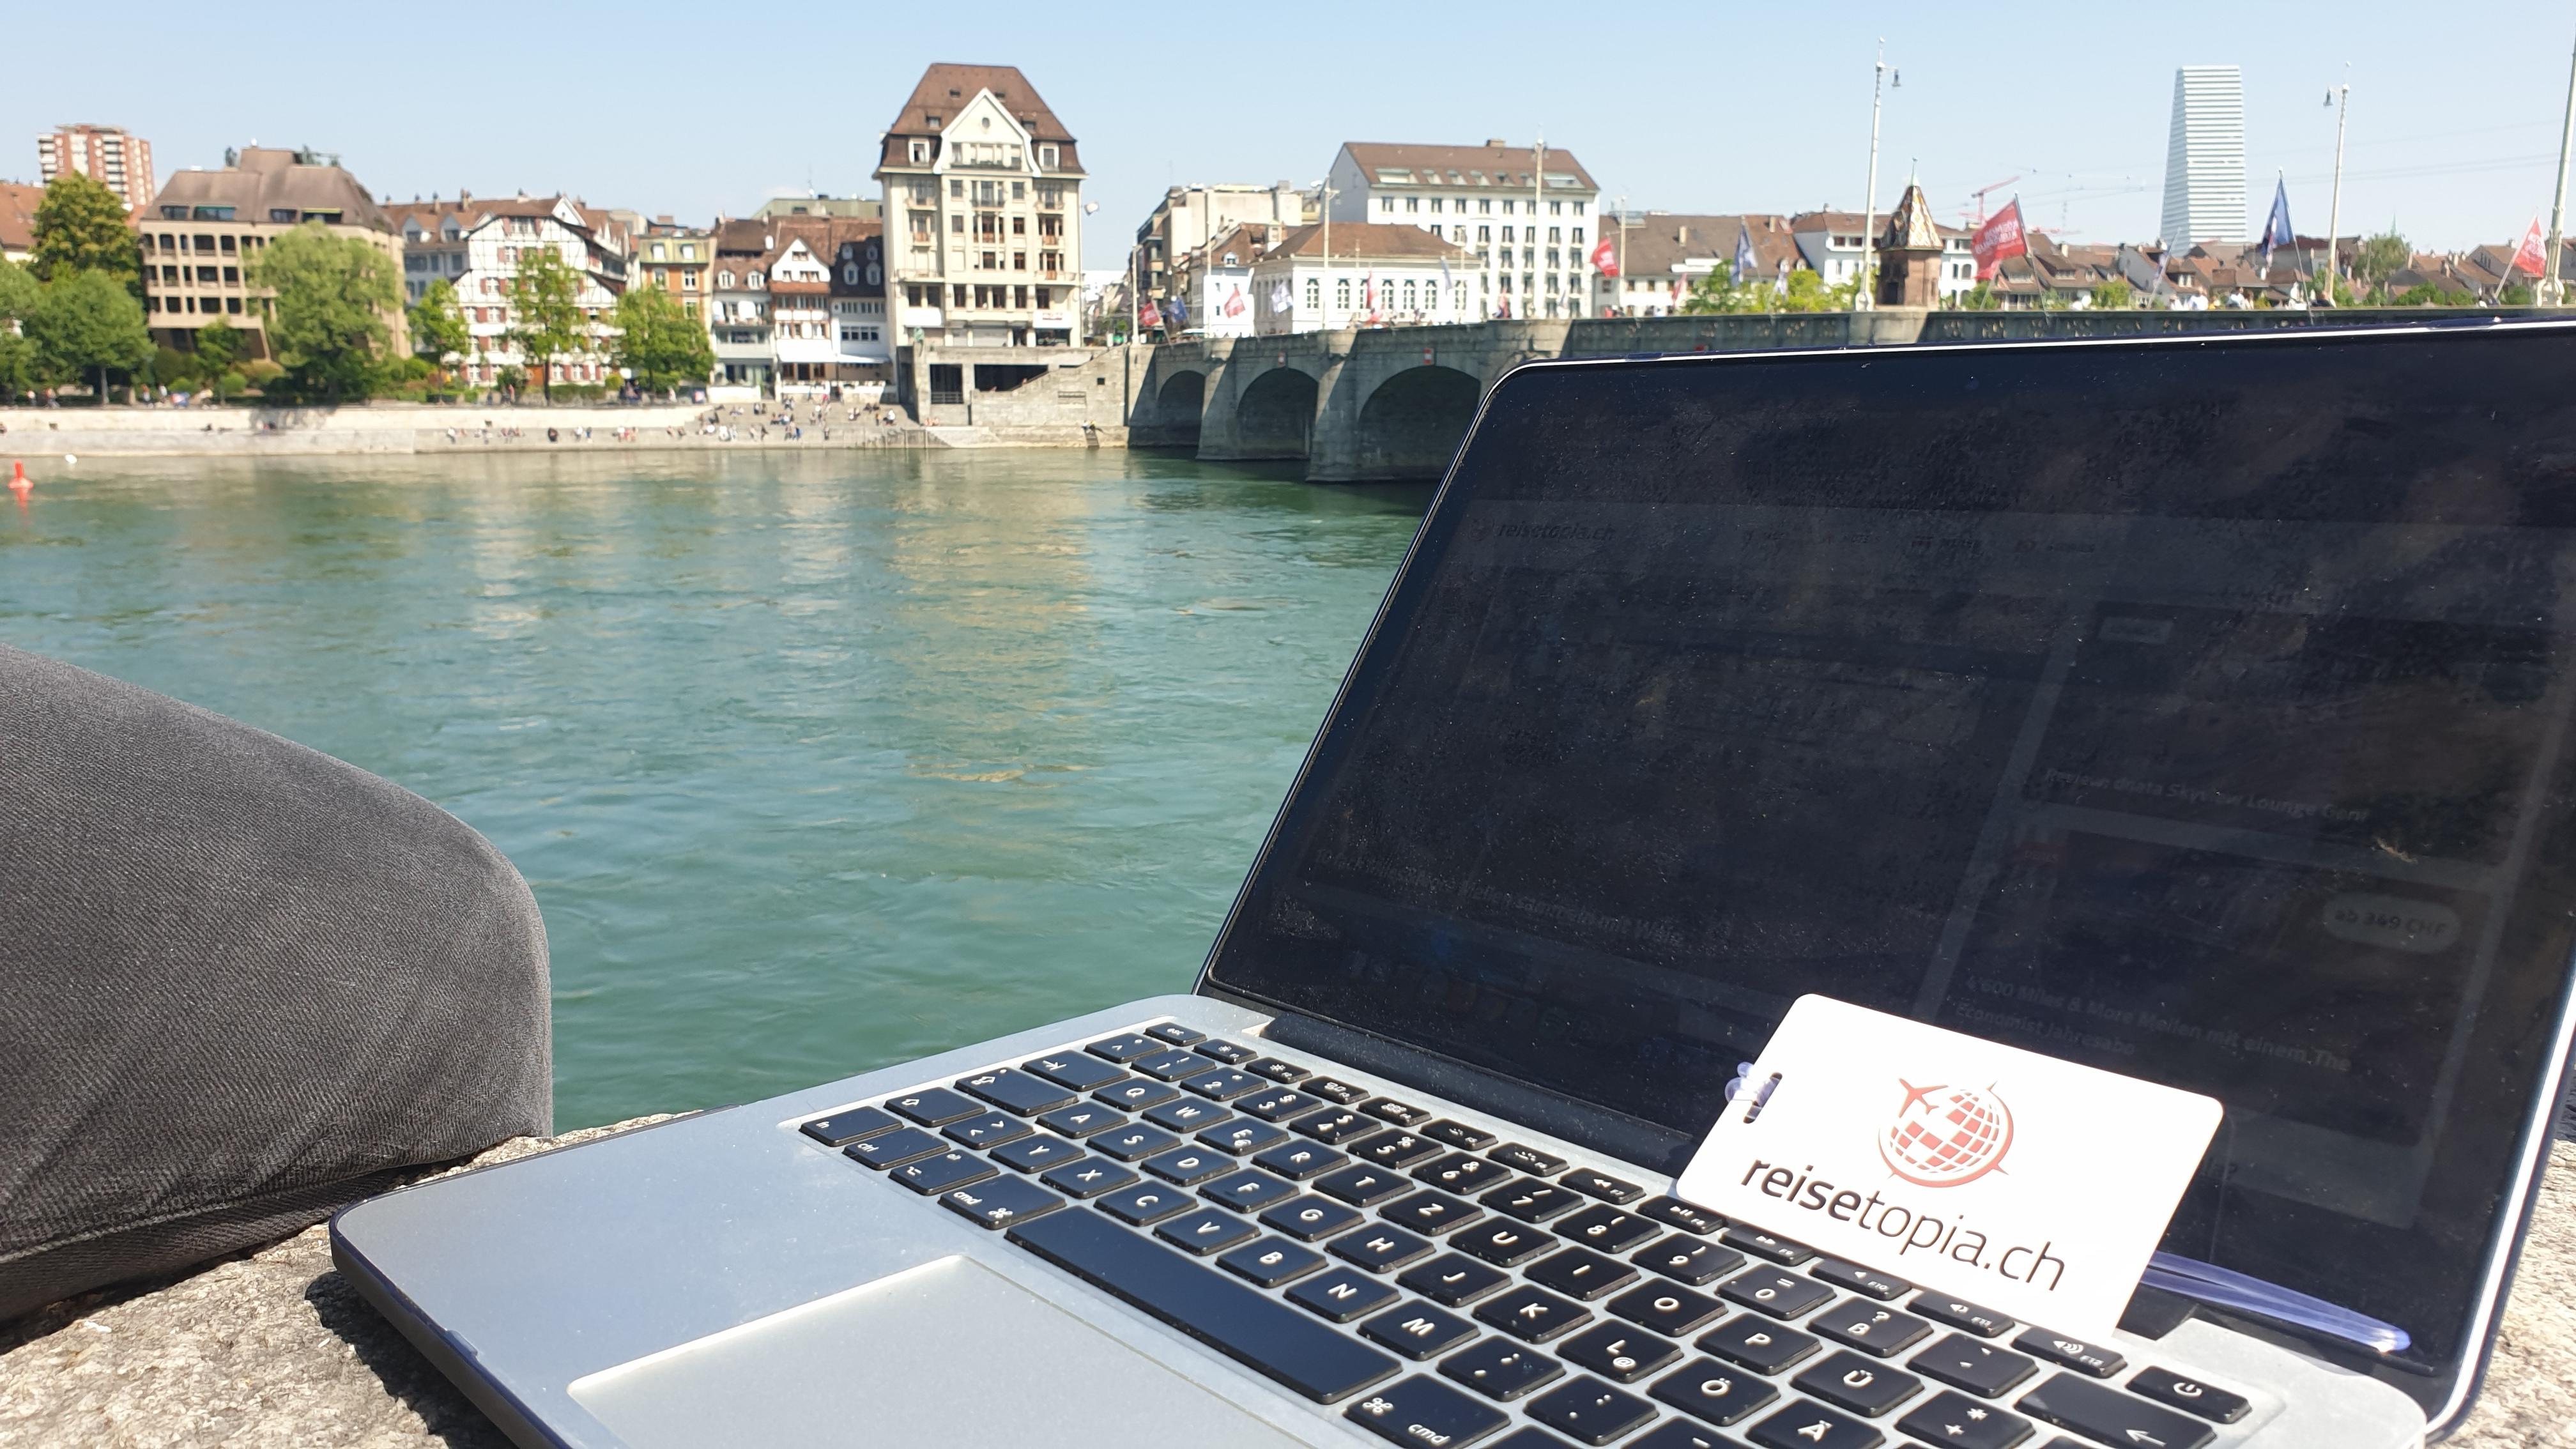 Basel Reisetopia CH Laptop Wochenrückblick 18